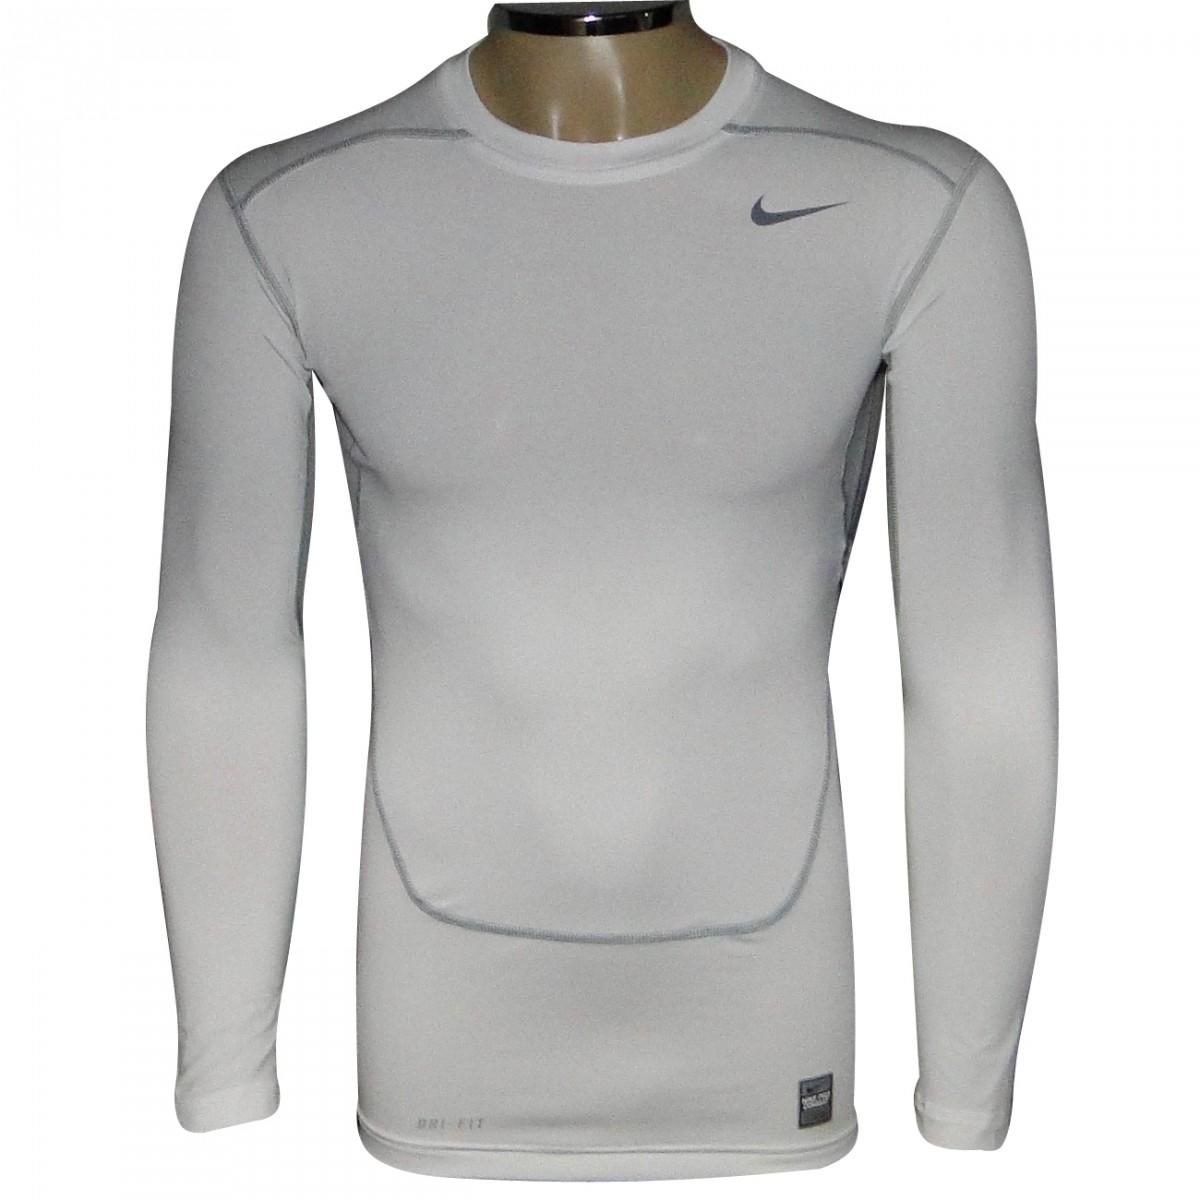 88f9fd9b7f Camisa Nike 449794 Termica 449794-100 - Branco - Chuteira Nike ...